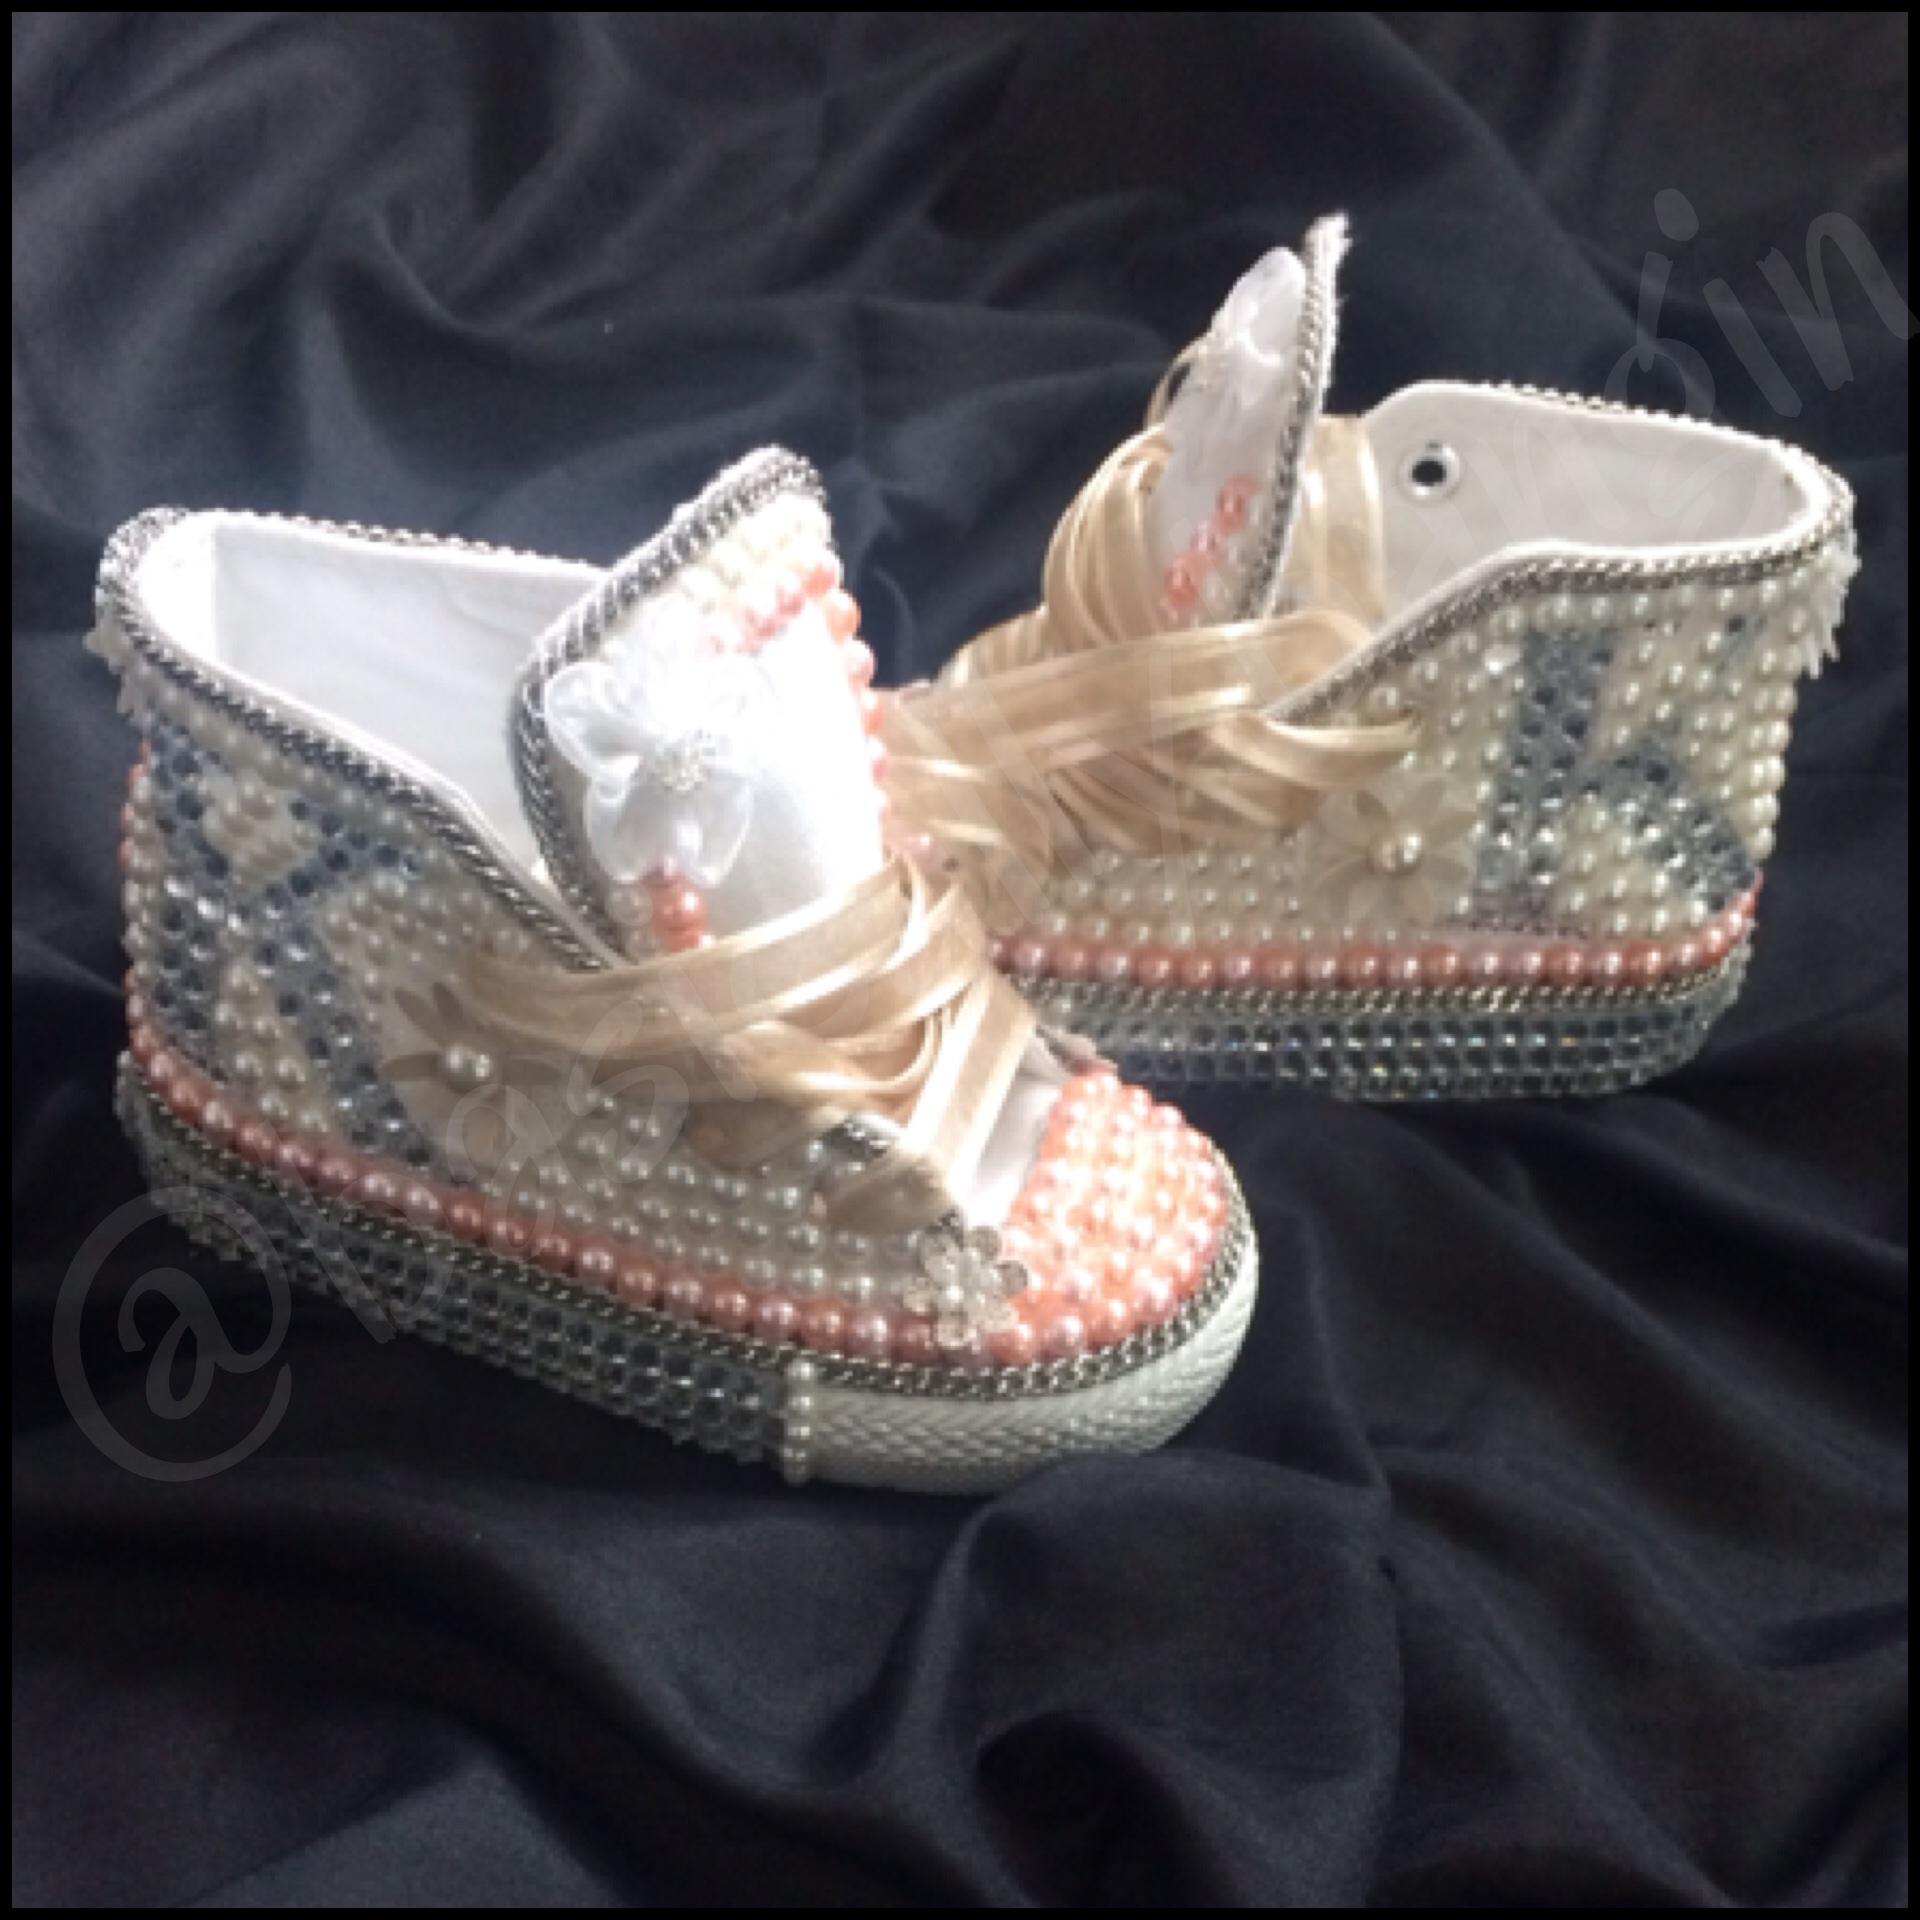 07936328281a Diamonds   Pearls Chucks (BIG KIDS Sizes 4-6) on Storenvy